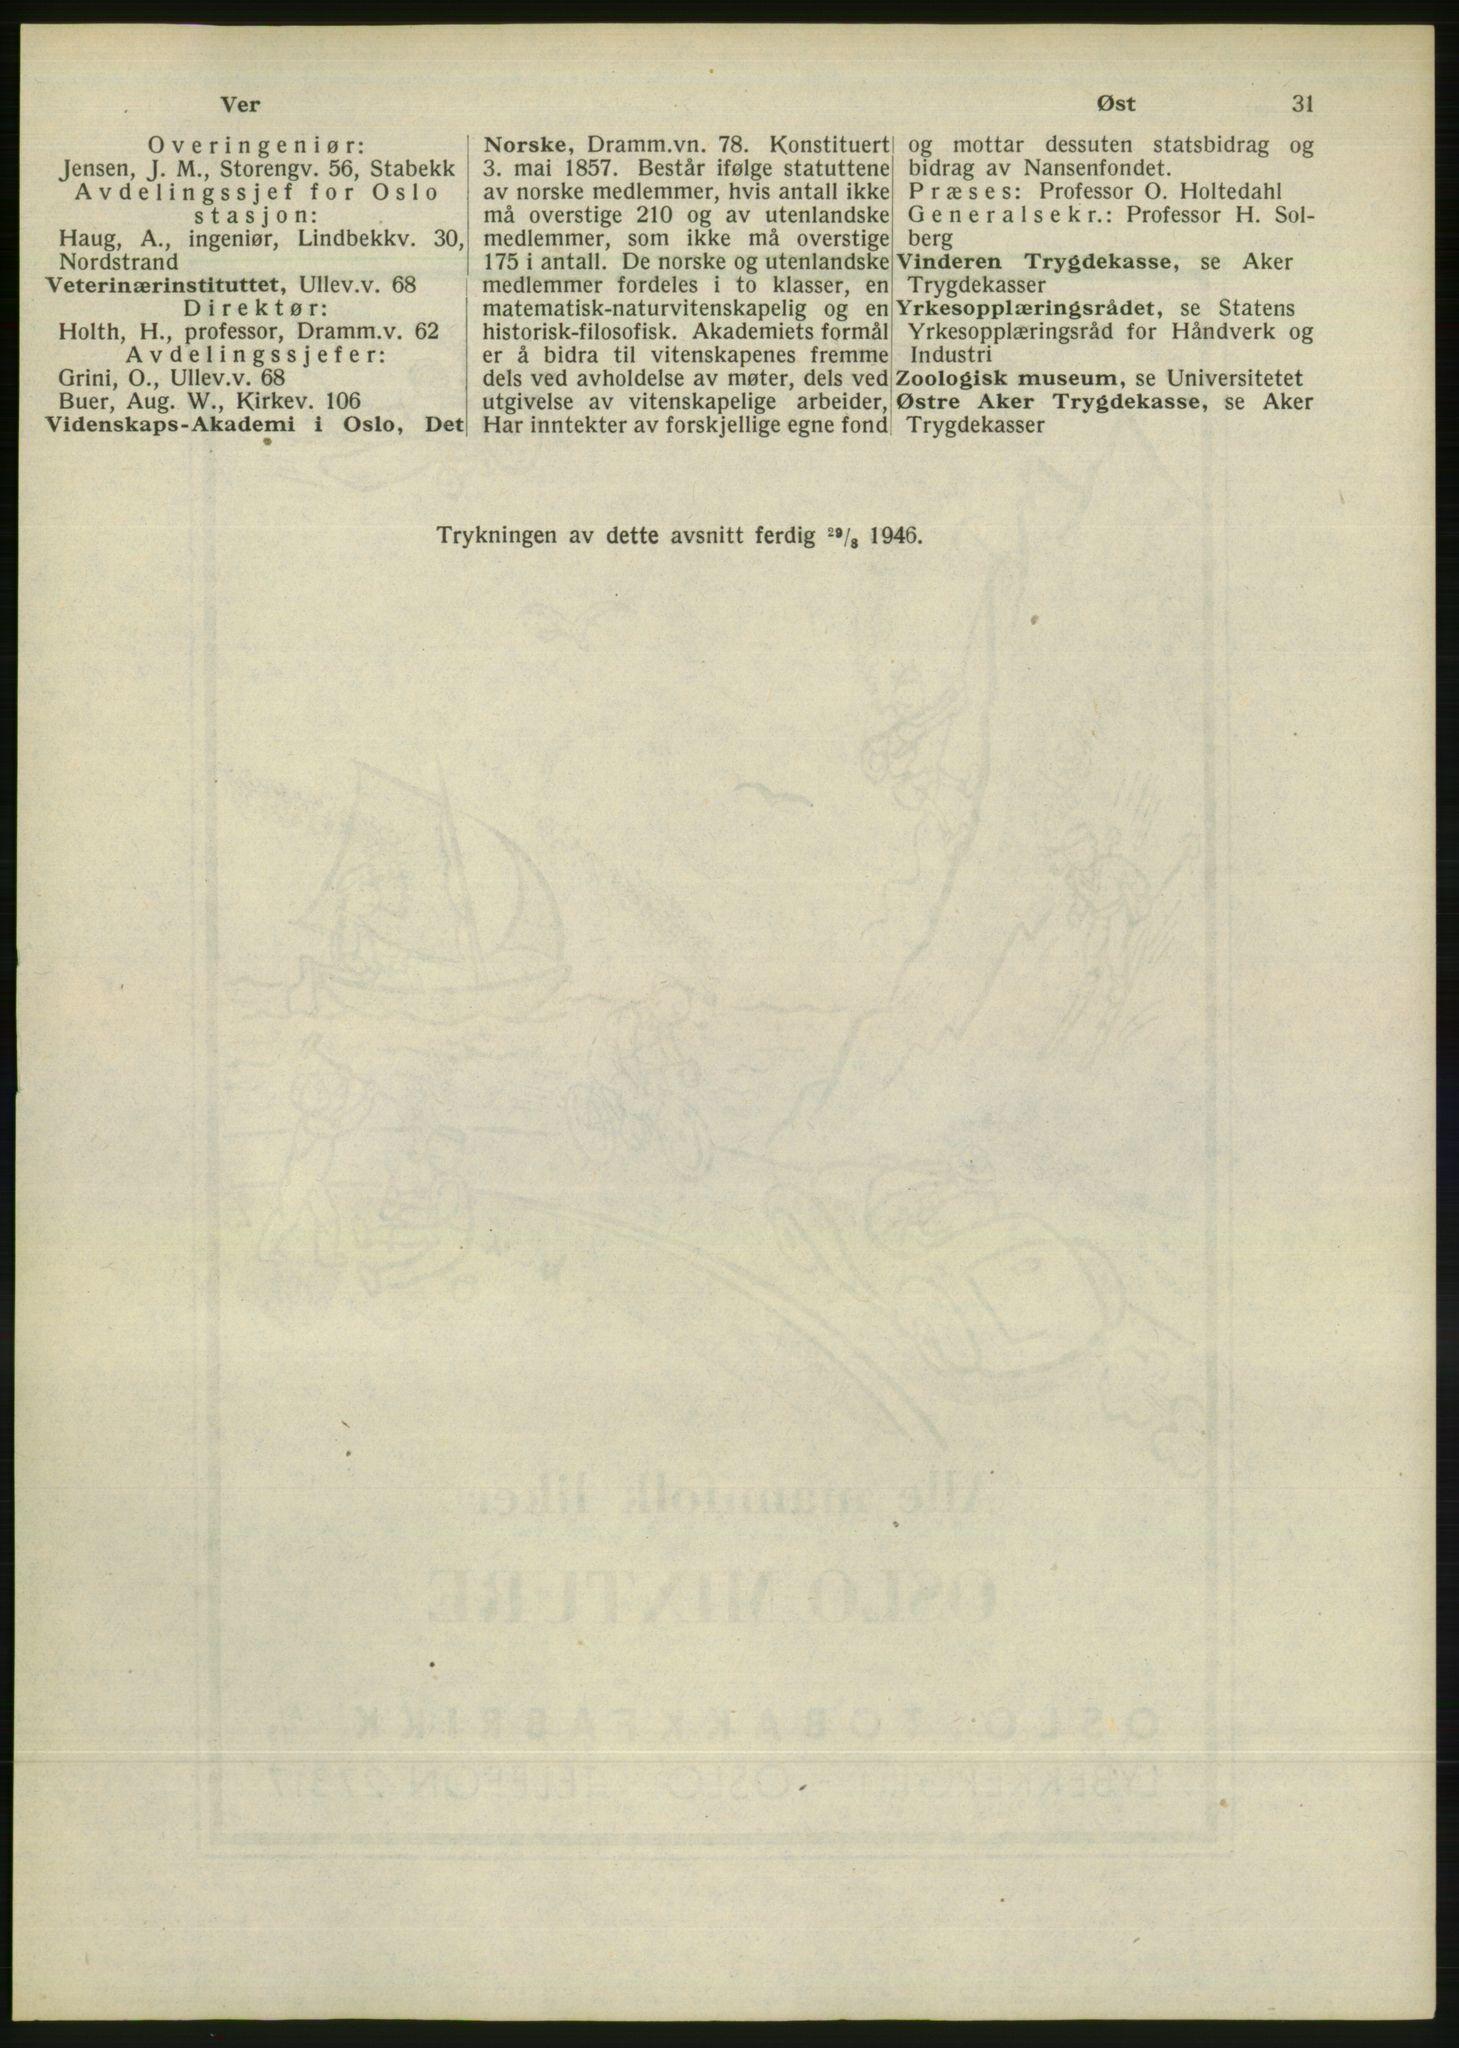 RA, Oslo adressebok (publikasjon)*, 1946, s. 31